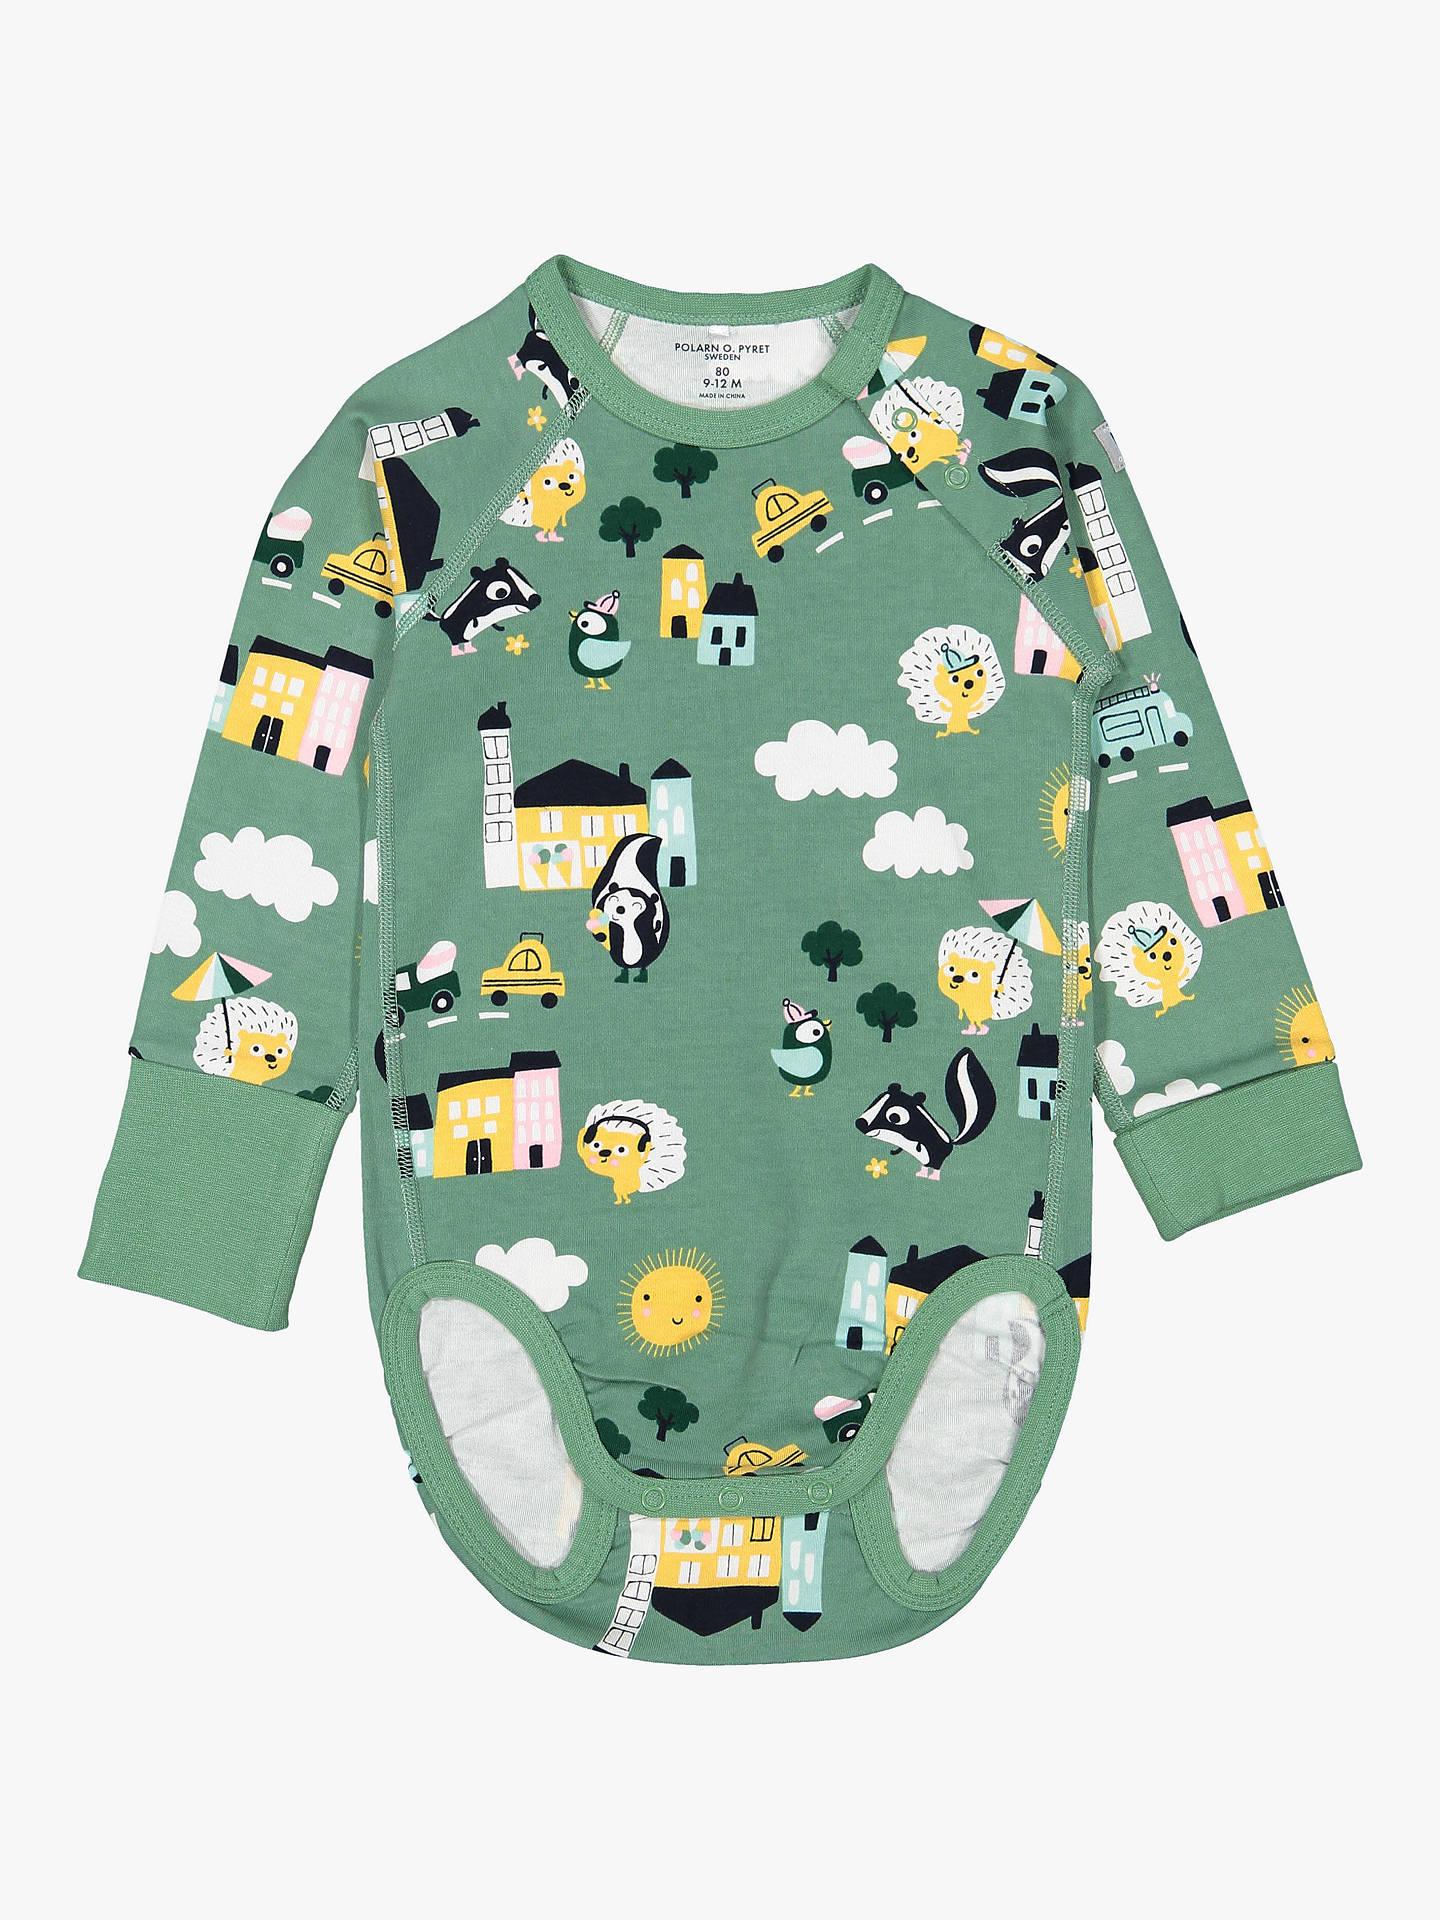 3f9e6811cb6 Buy Polarn O. Pyret Baby GOTS Organic Cotton Town Print Long Sleeve  Bodysuit